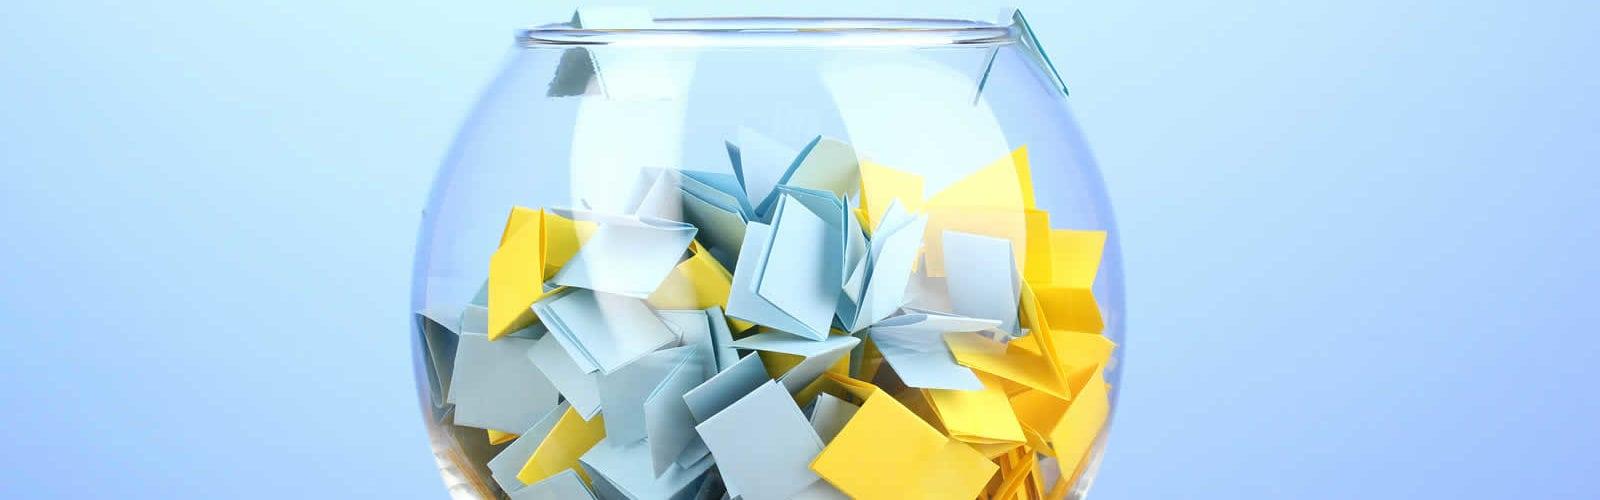 resultats-tombola-bastille-day-2018-gagnants-lots-une